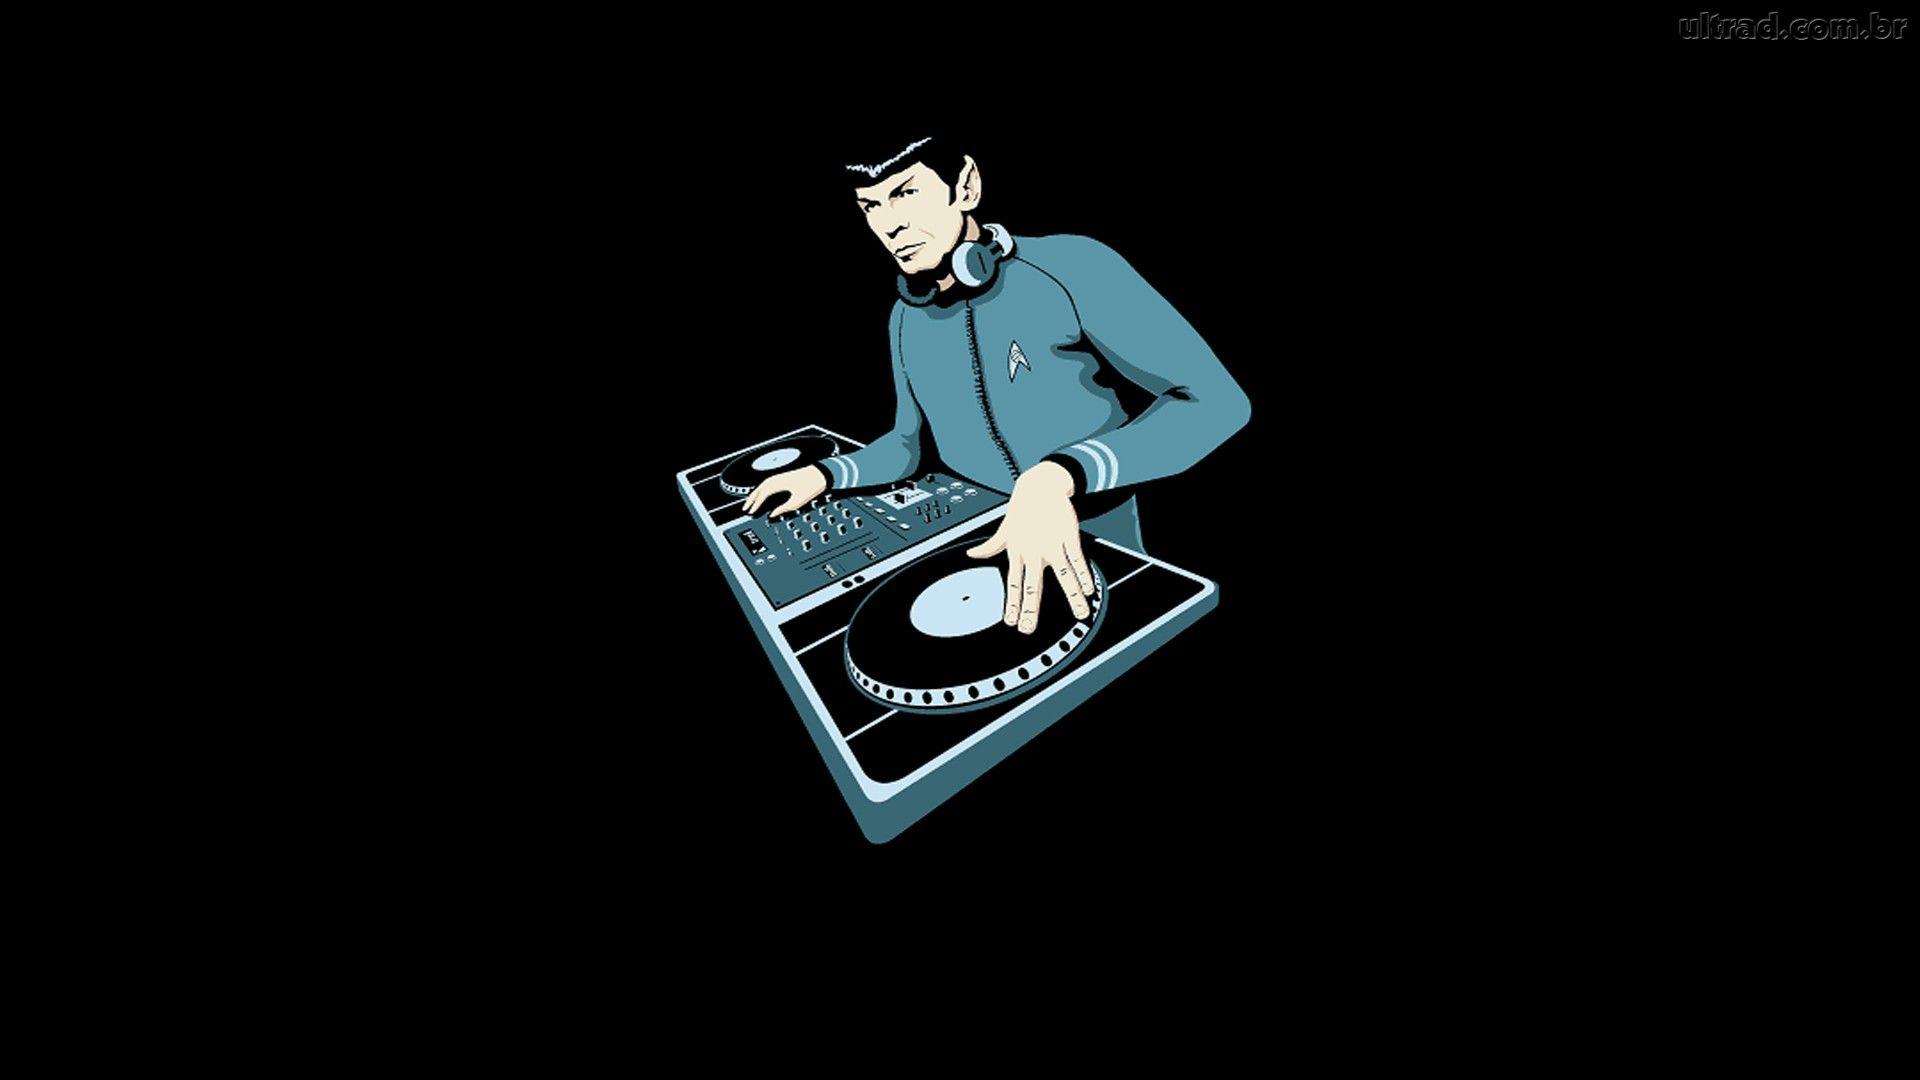 StuffZilla DJ Spock Illustration 1920x1080